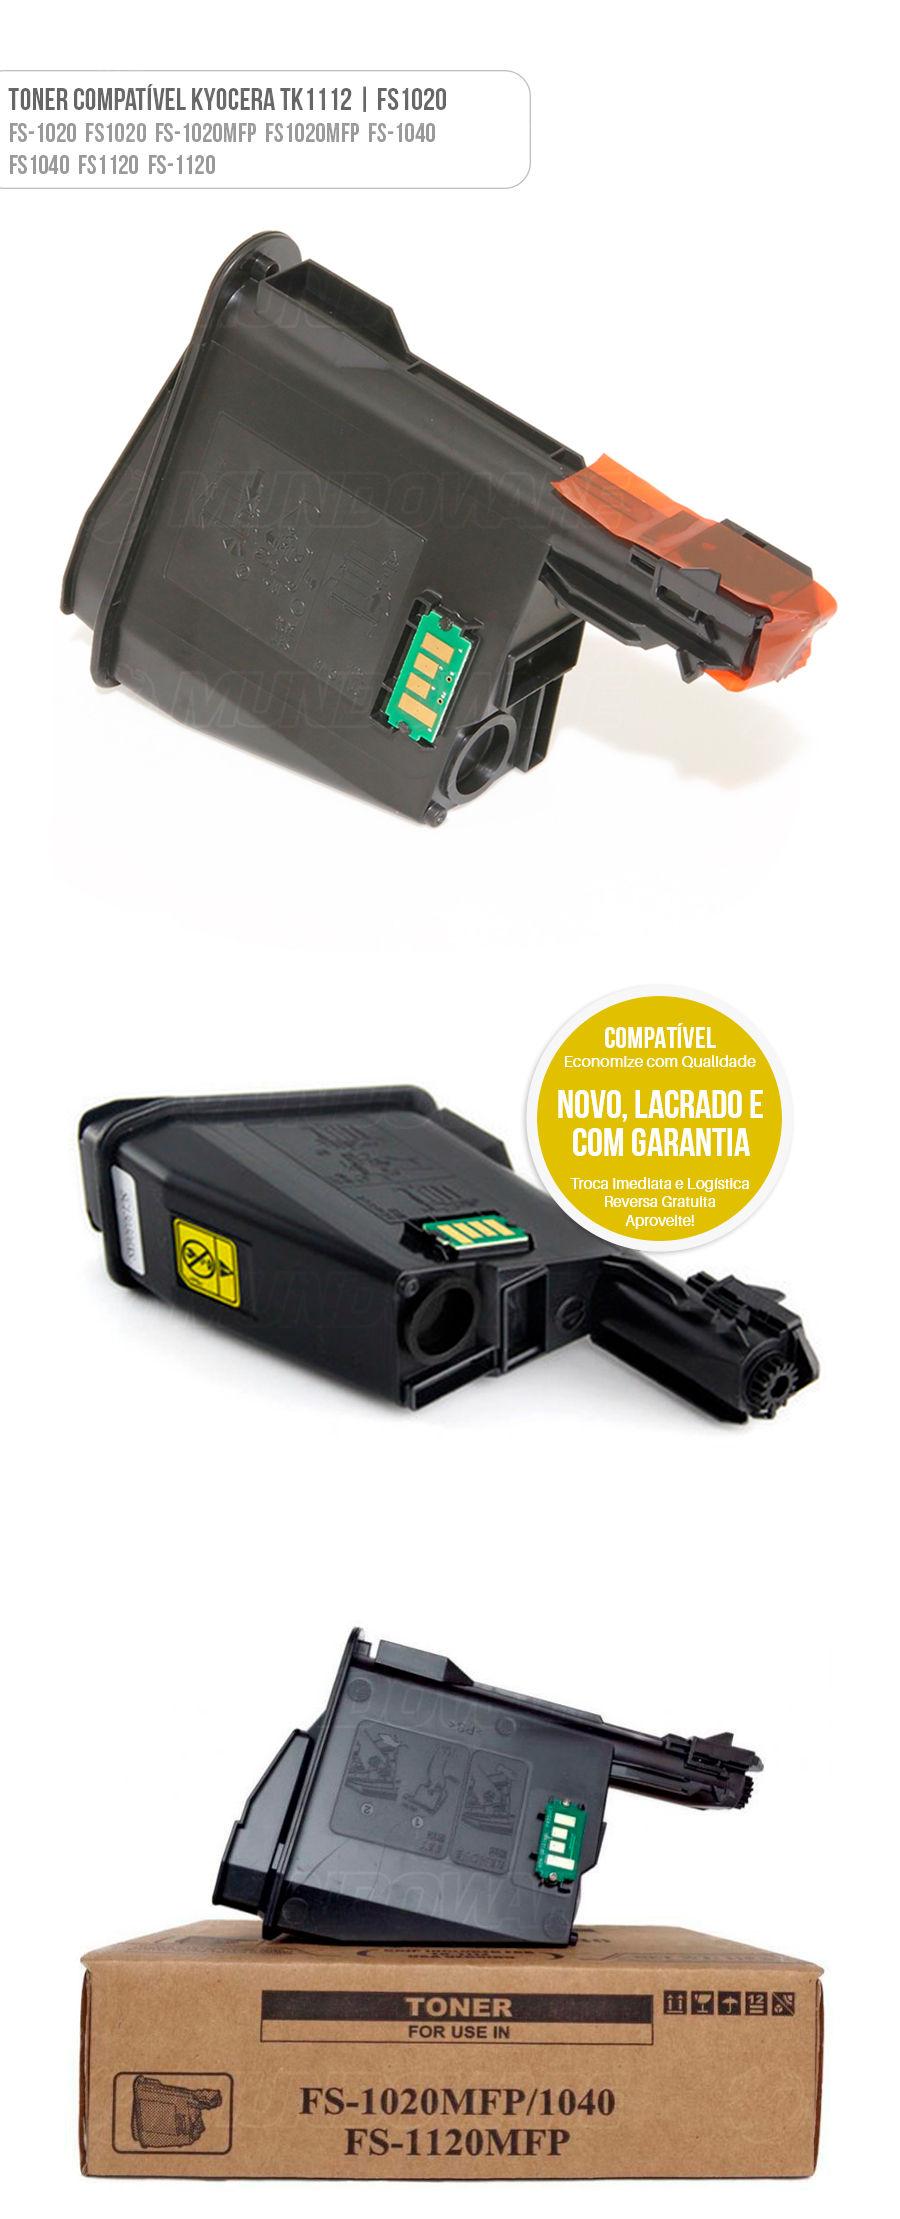 Tonner FS-1020 FS1020 FS-1020MFP FS1020MFP FS-1040 FS1040 FS1120 FS-1120